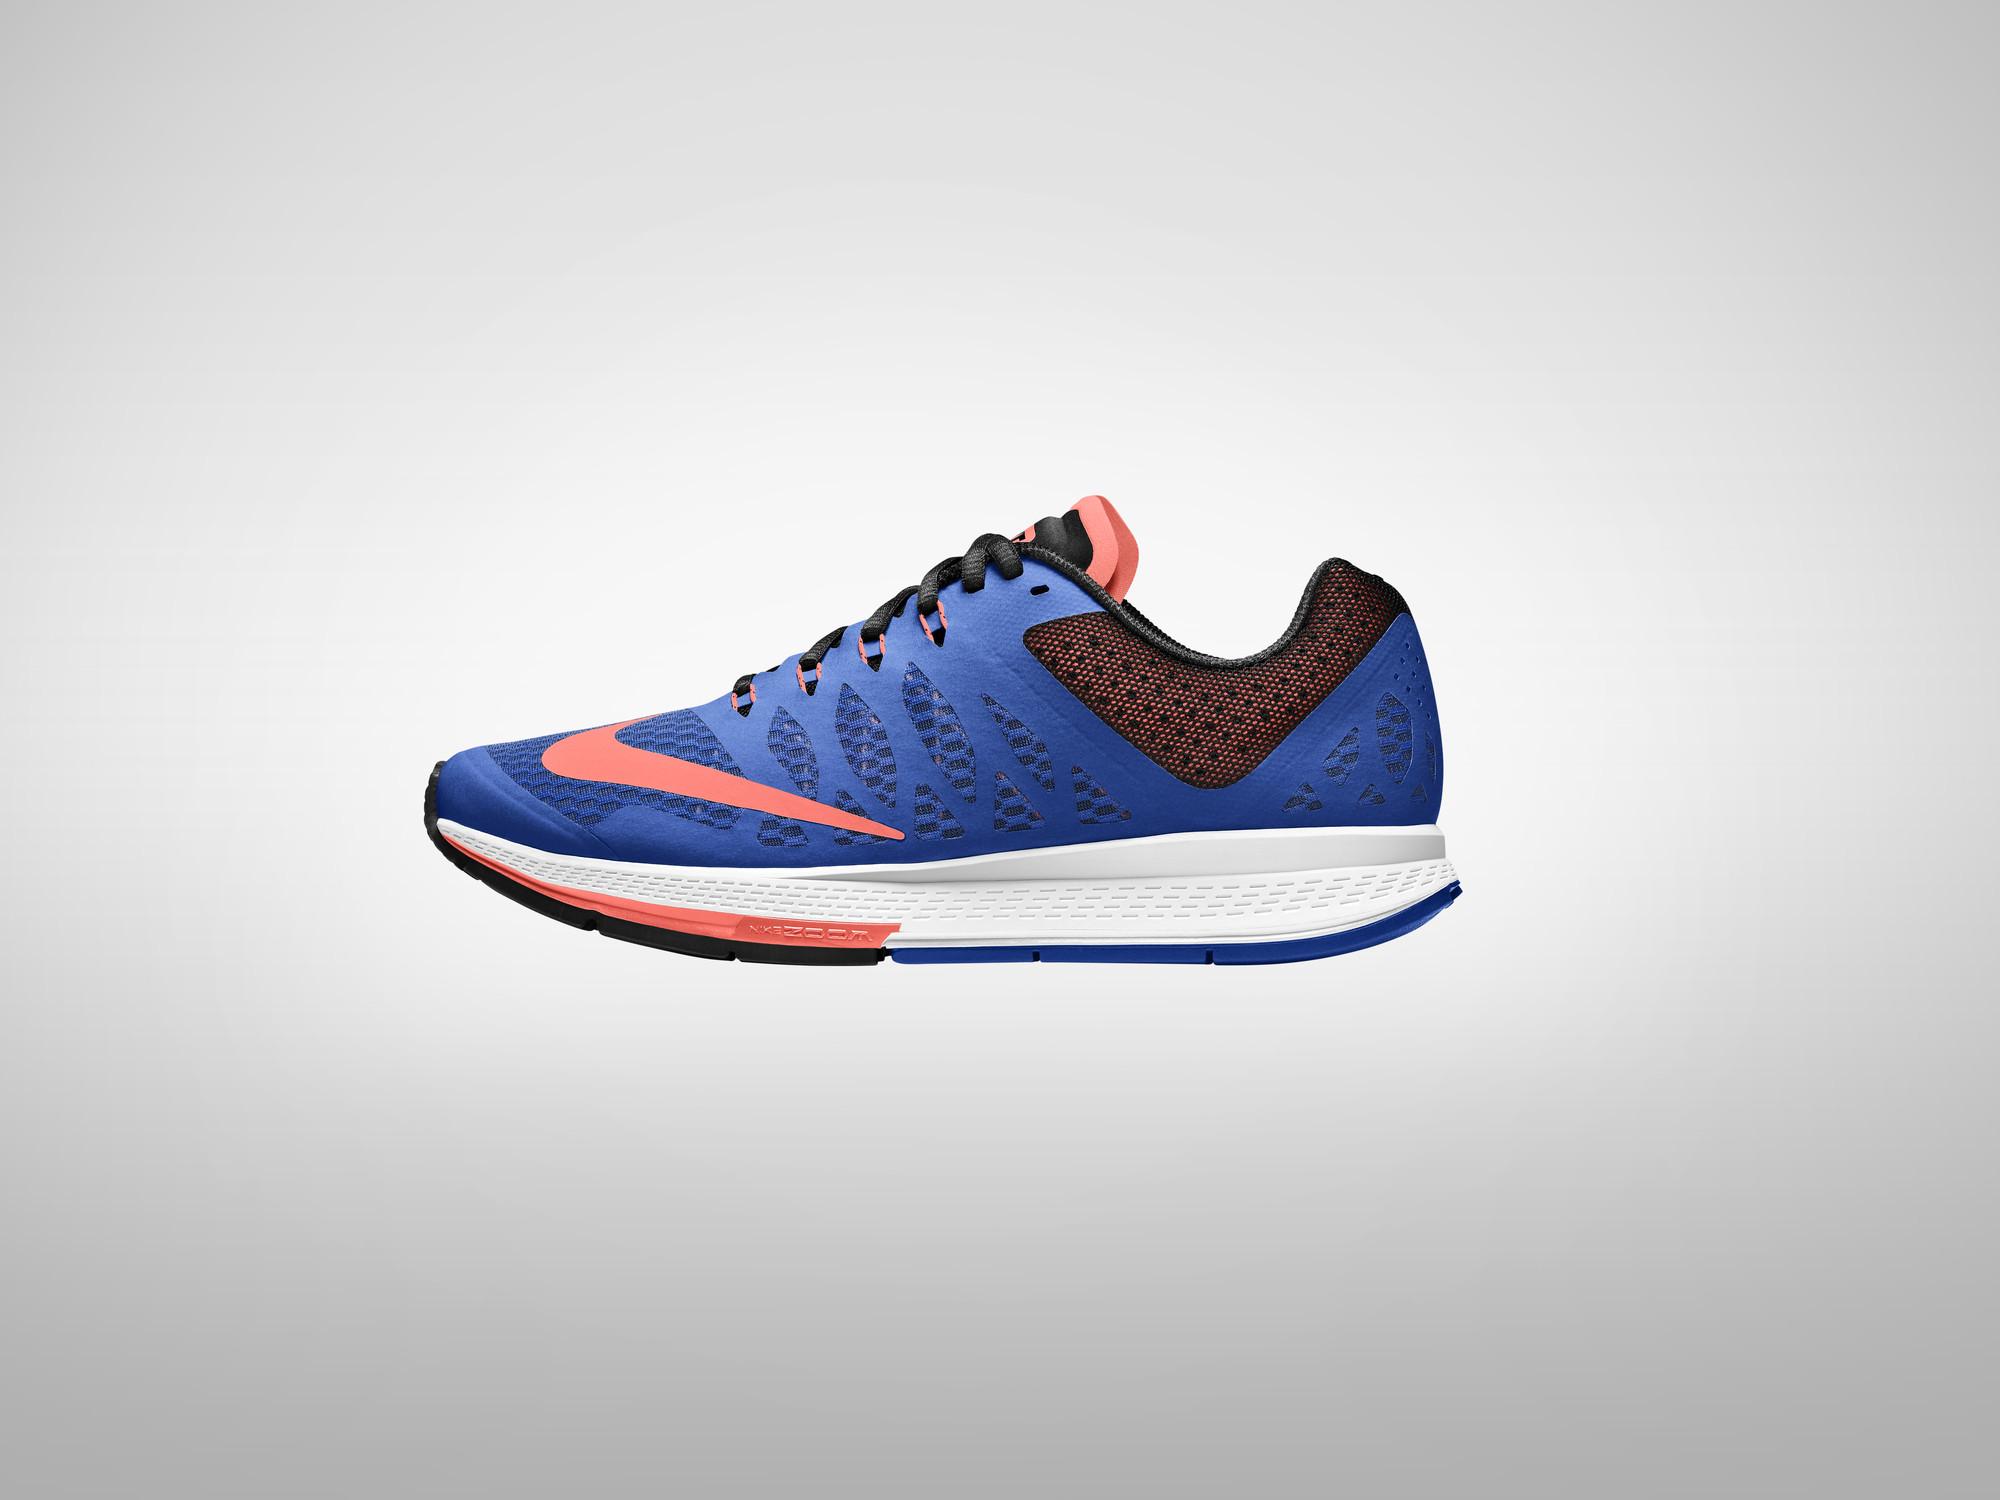 Nike Air Zoom Elite 7 The Lightes Yet 9